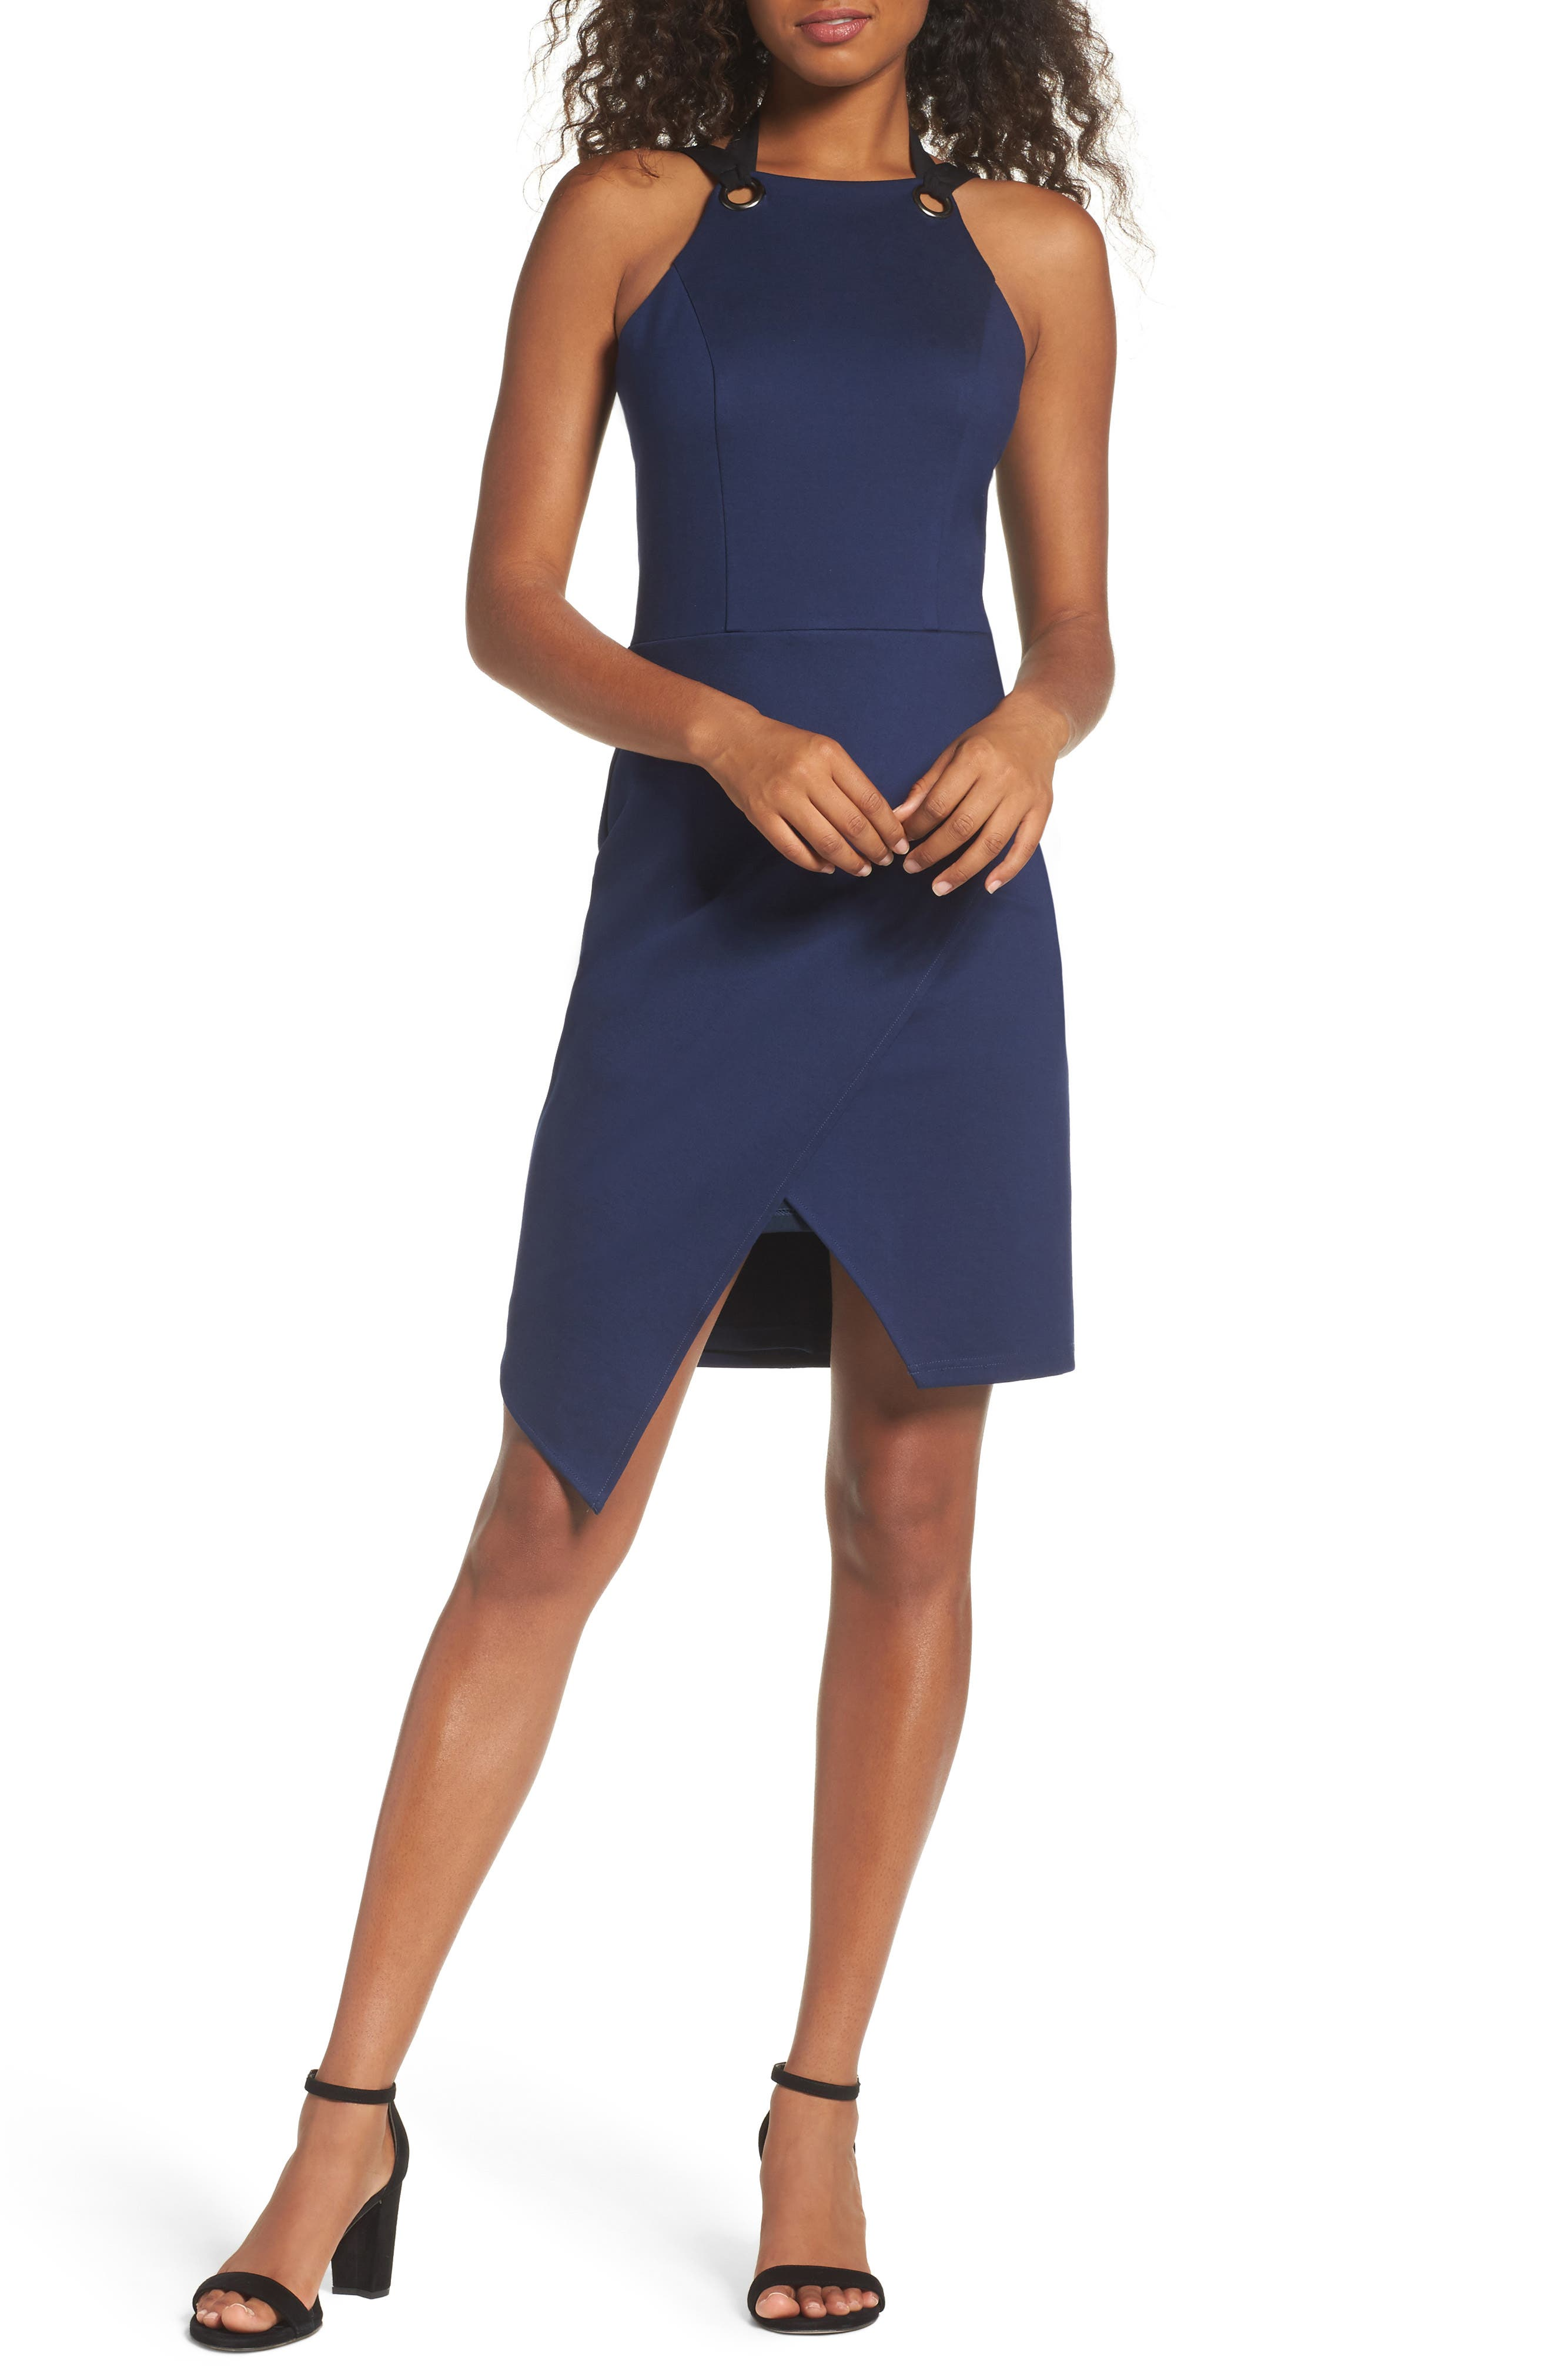 Main Image - Adelyn Rae Brandi Tie Back Sheath Dress